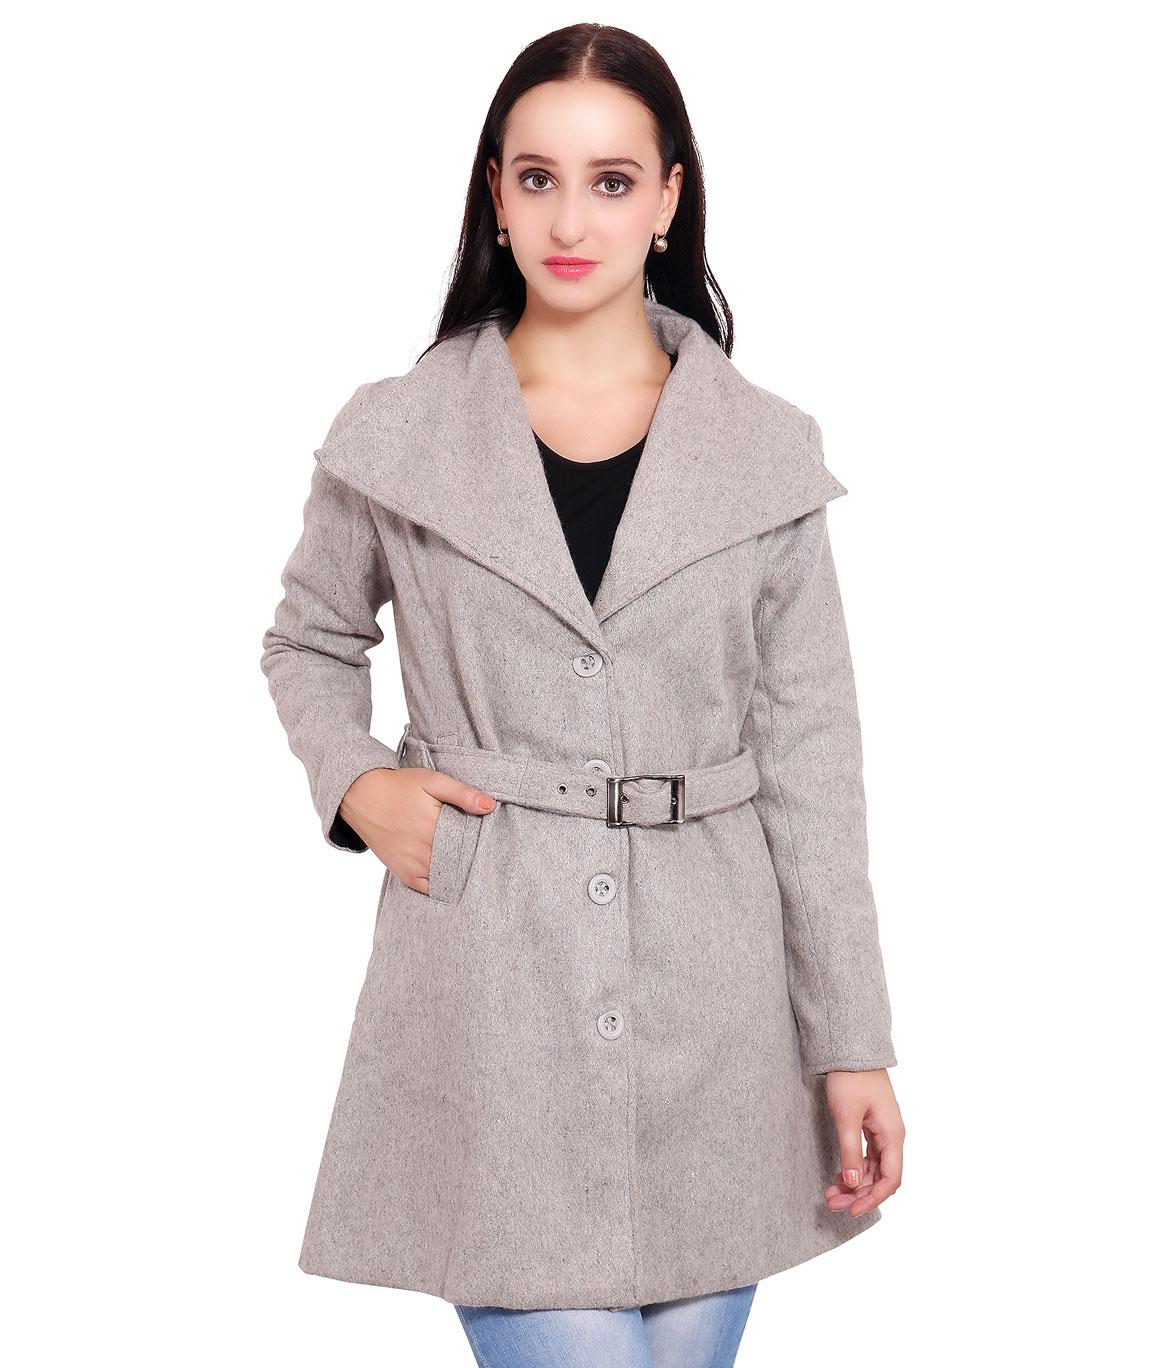 FAZZN Long Woolen Coats(Gray)